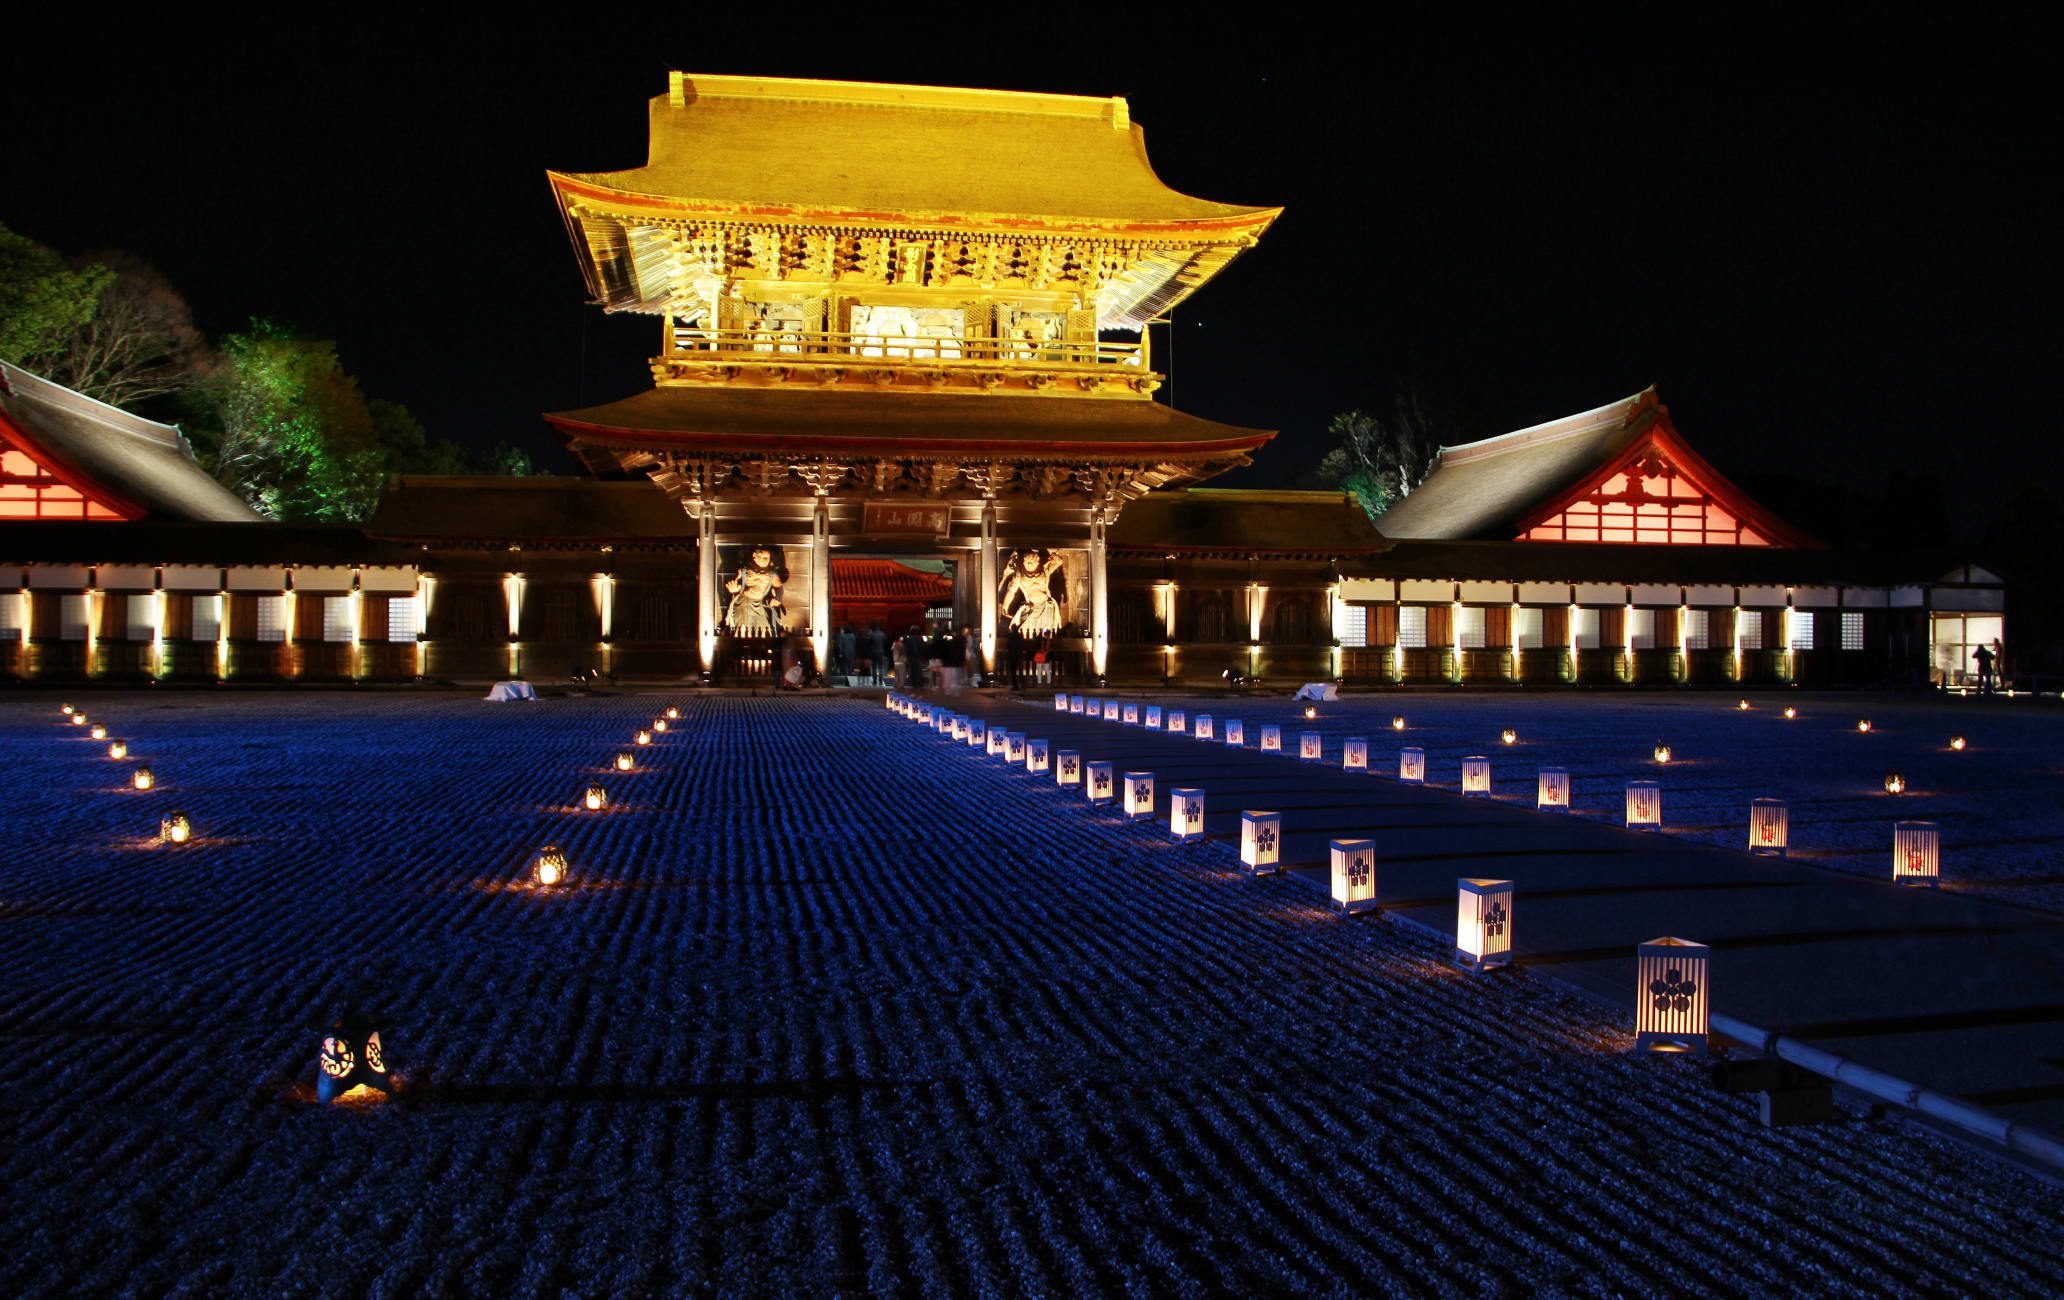 Zuiryuji Temple